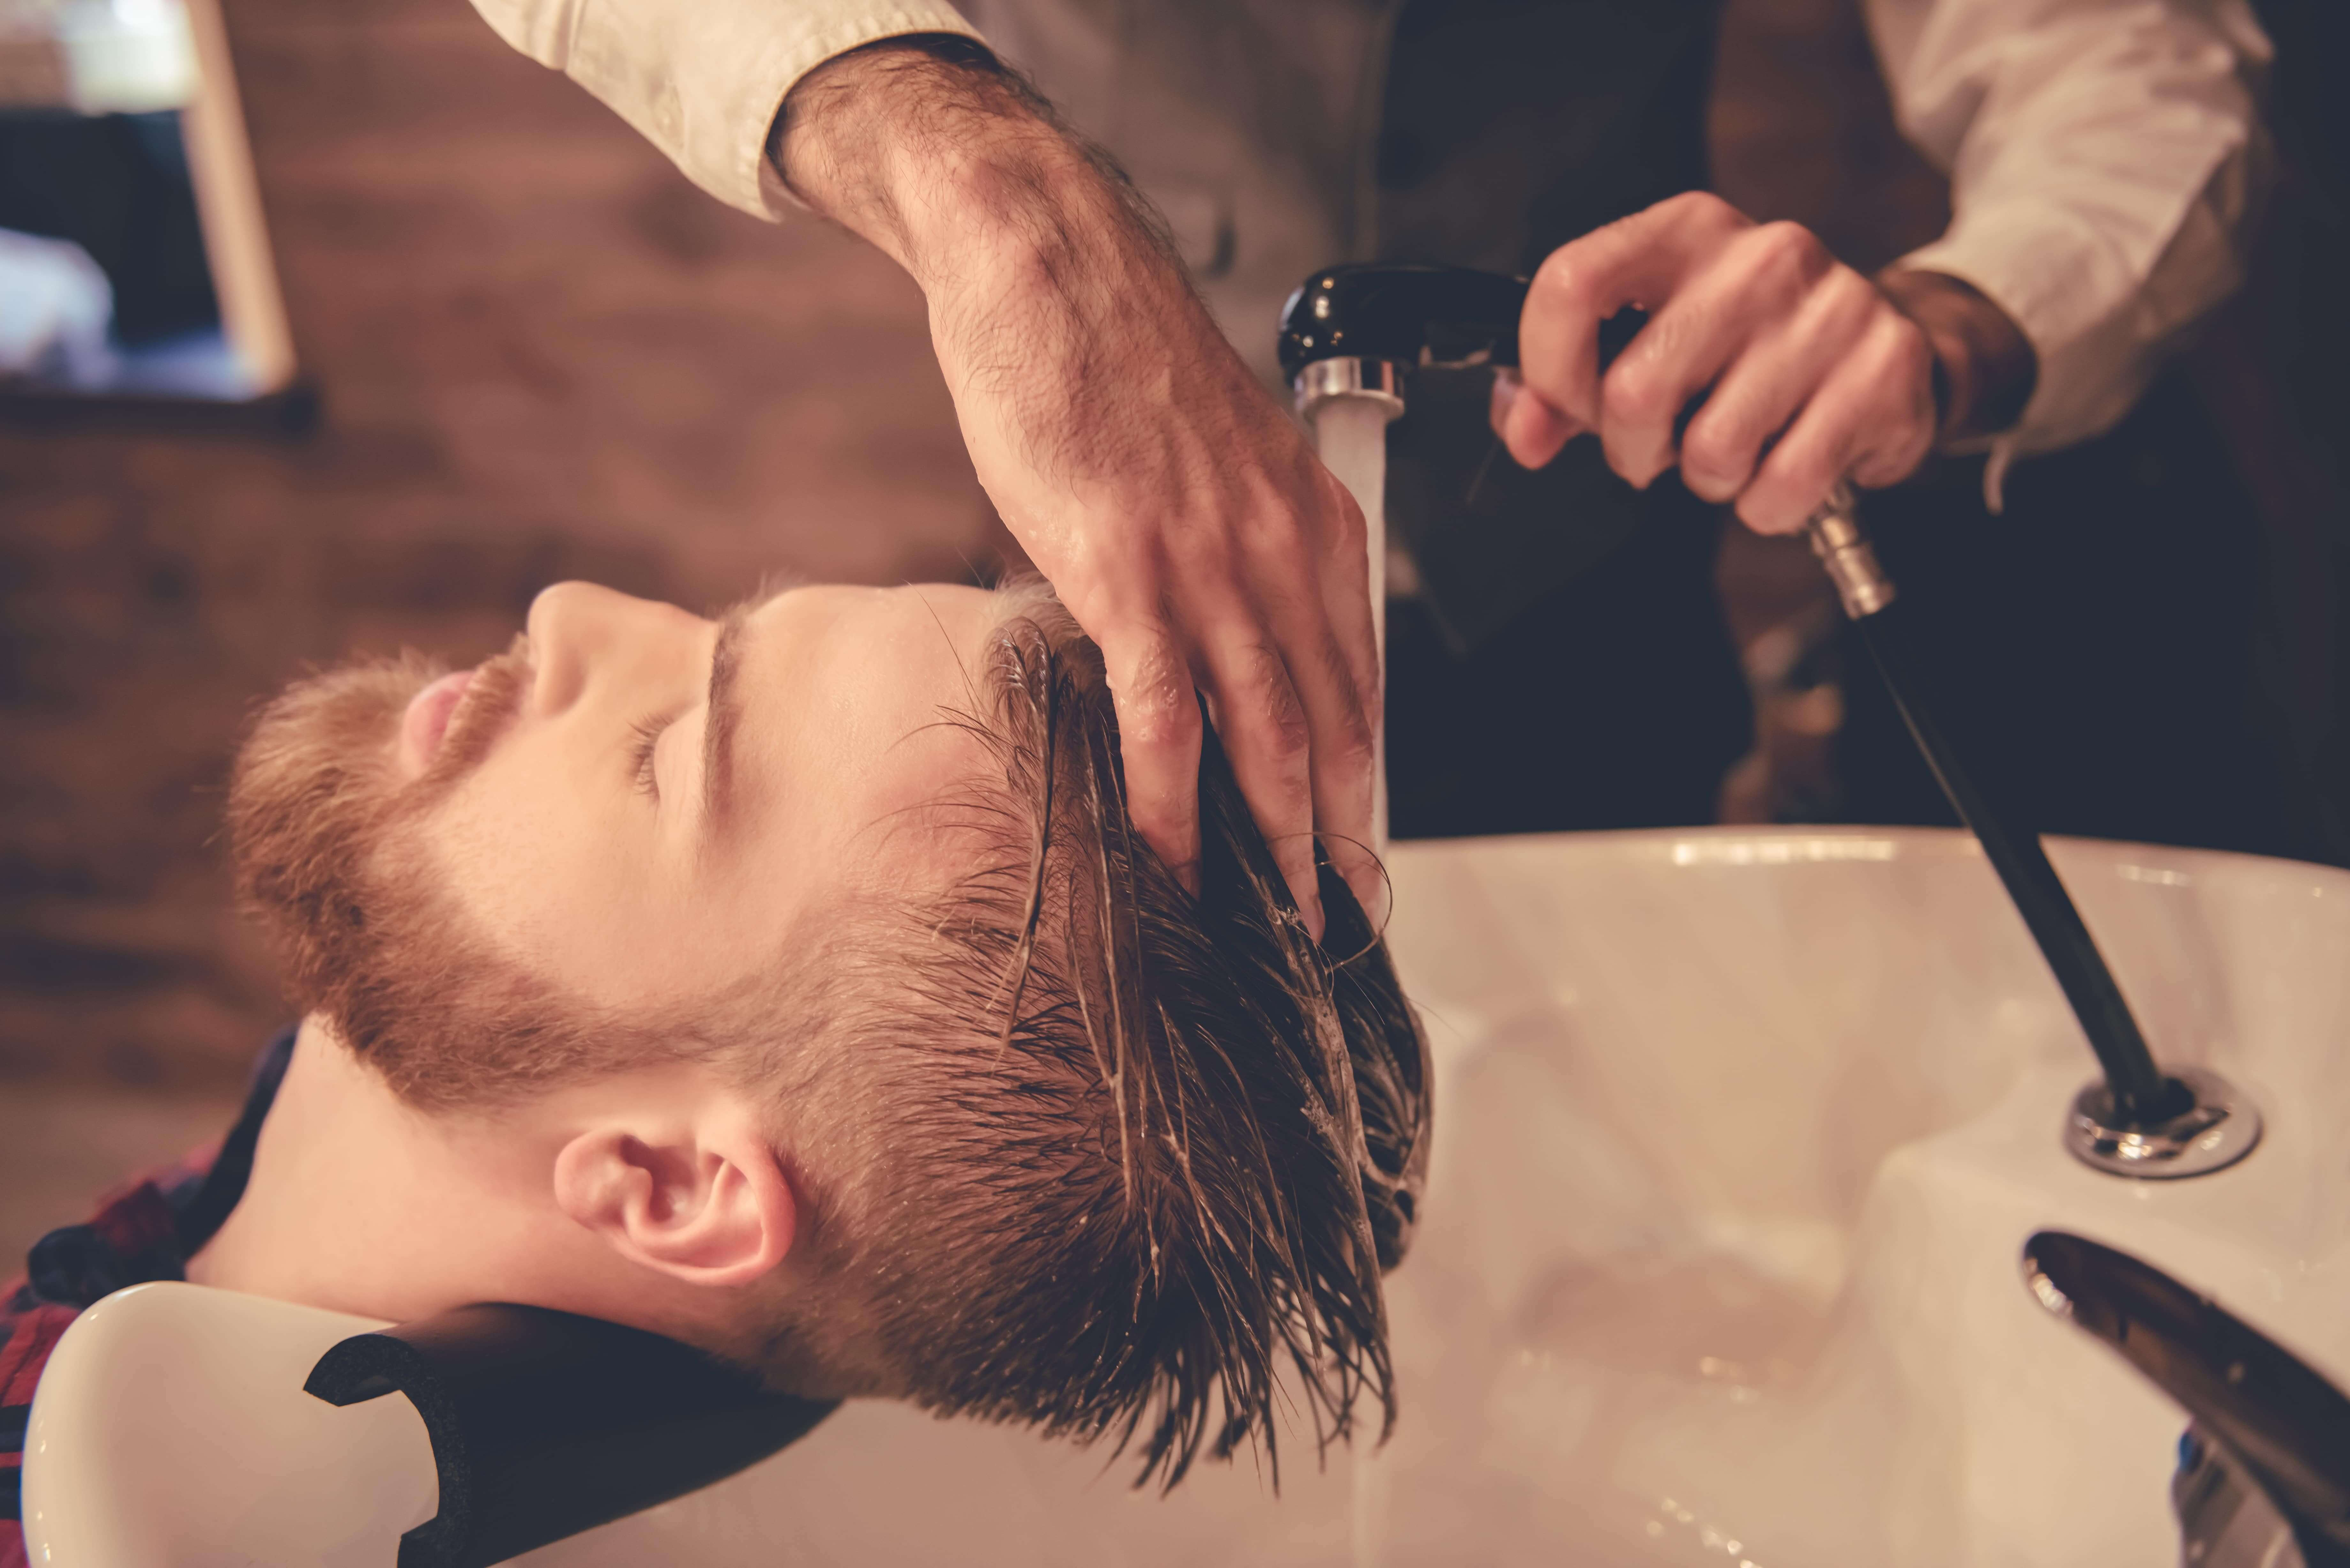 lavado de cabello para hombres